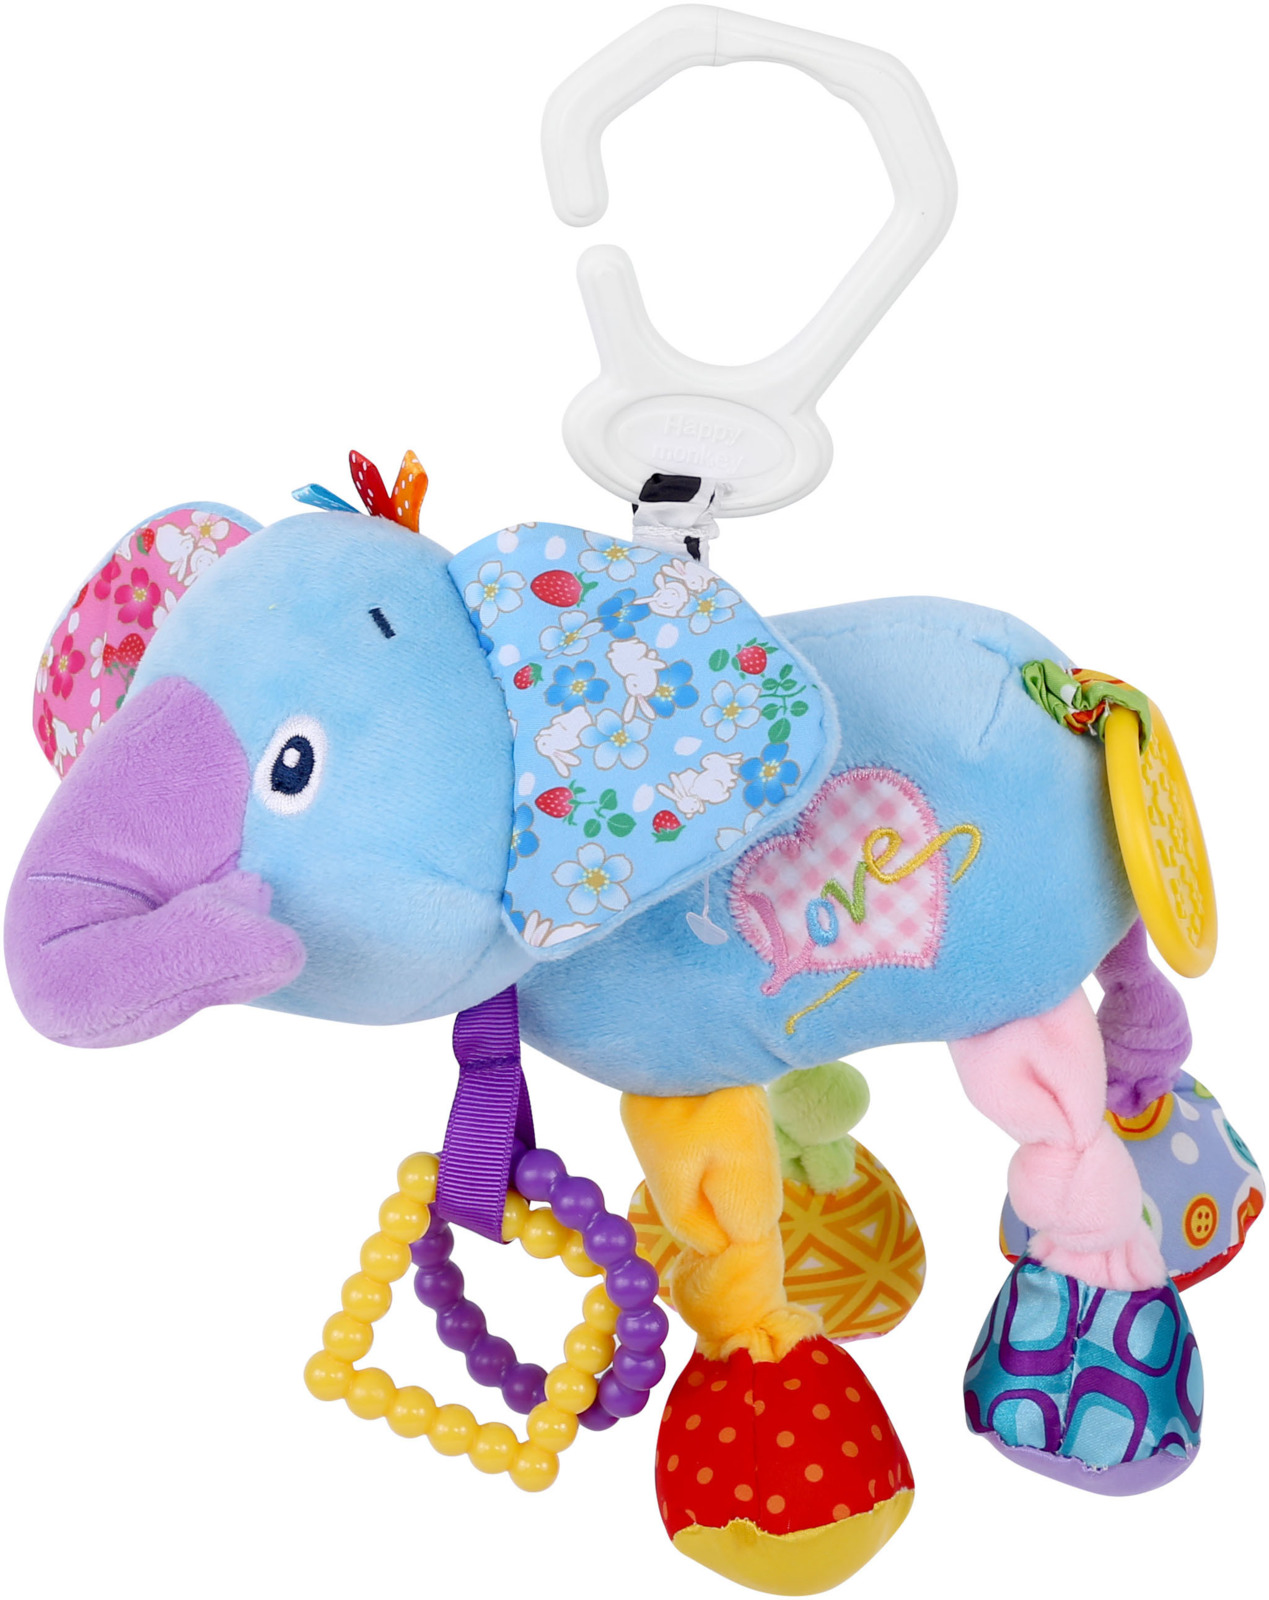 Развивающая игрушка Lorelli Toys Слоник. 1019117 развивающая игрушка lorelli toys слоник 1019117